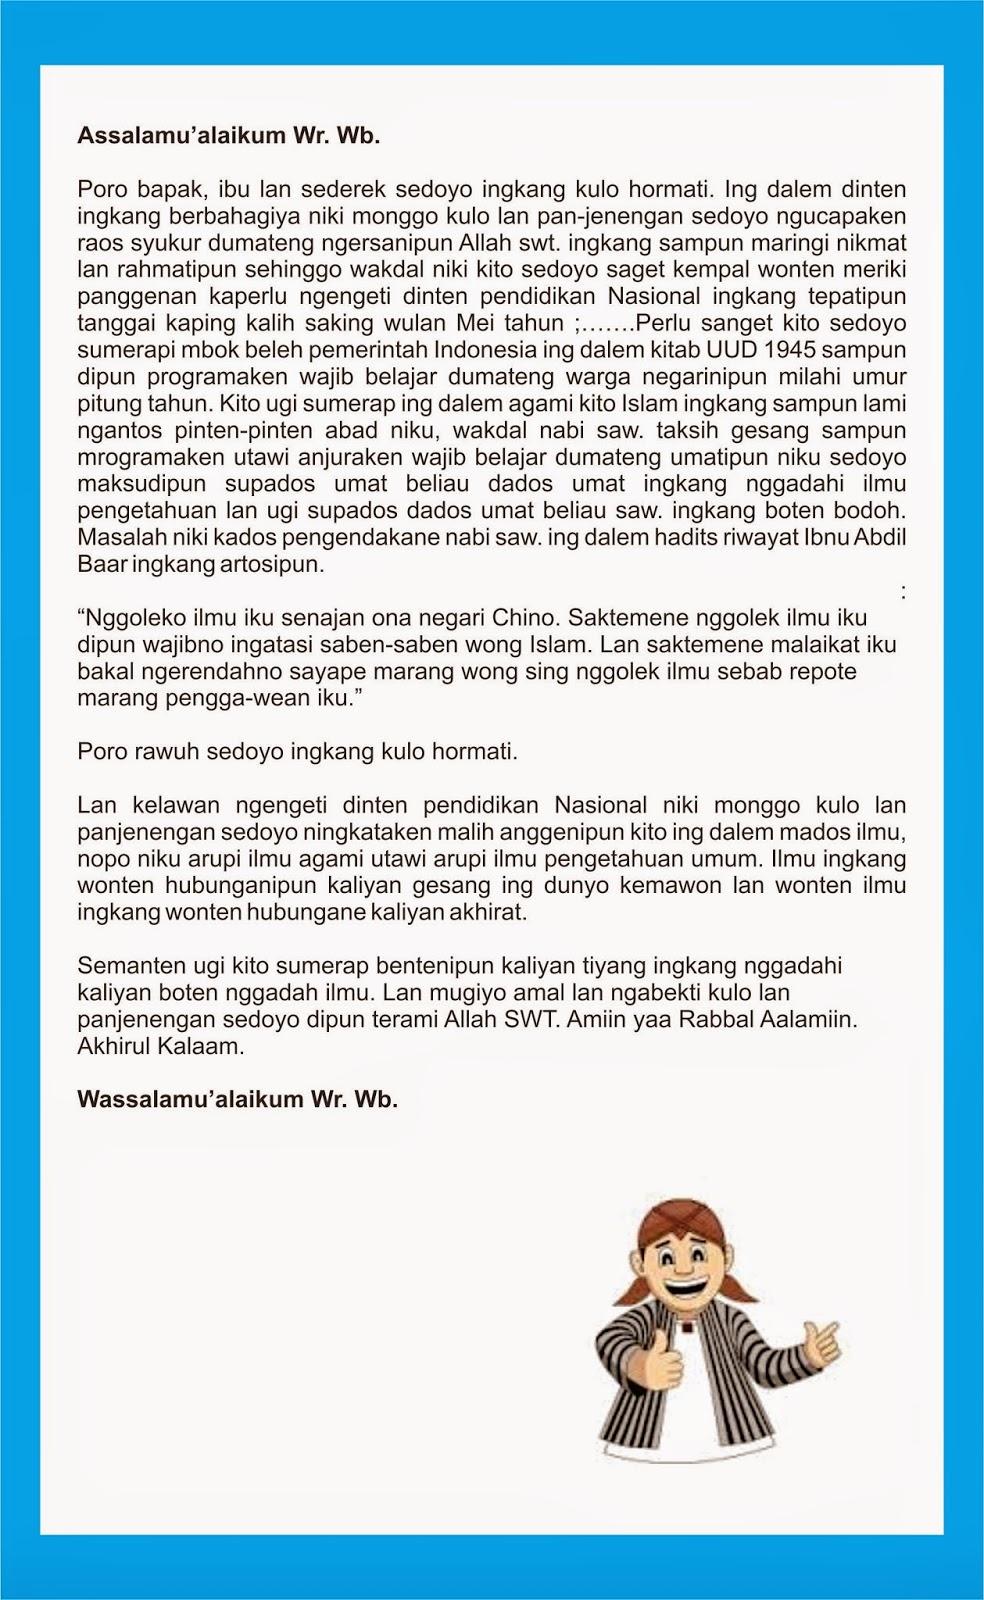 Contoh Pawarta Bahasa Jawa Singkat Tentang Pendidikan Terkait Pendidikan